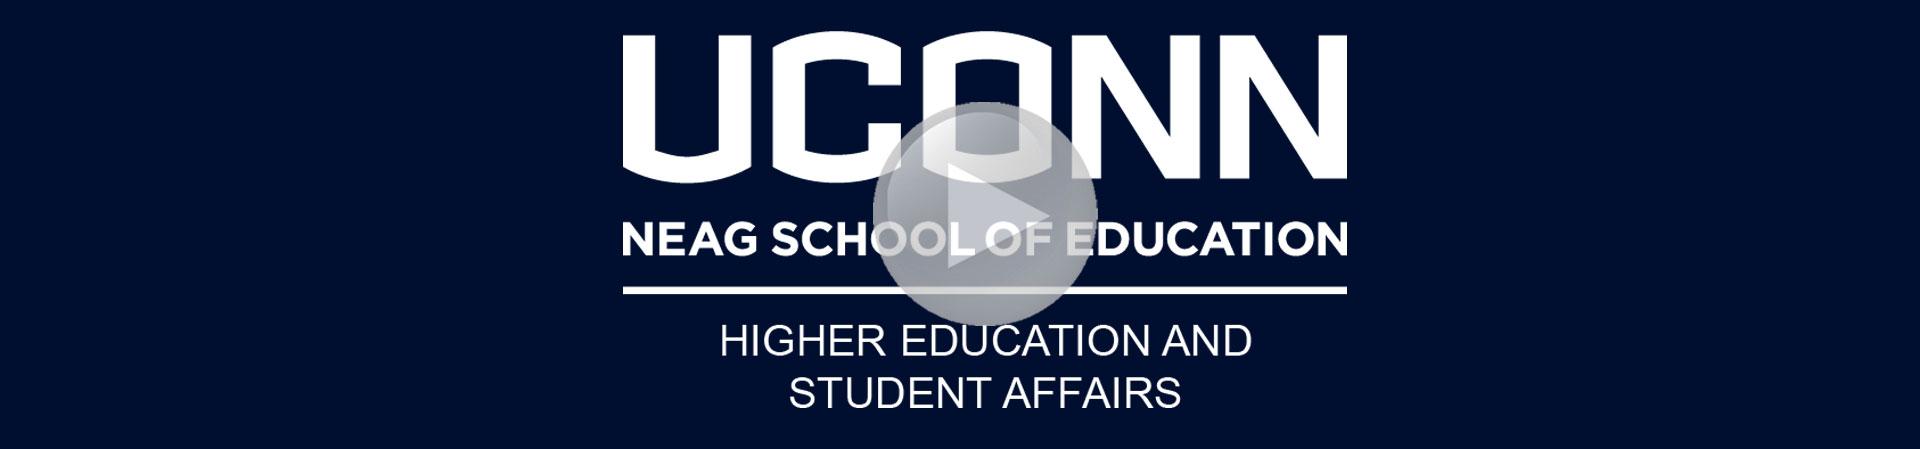 Blue Neag School of Education HESA logo banner